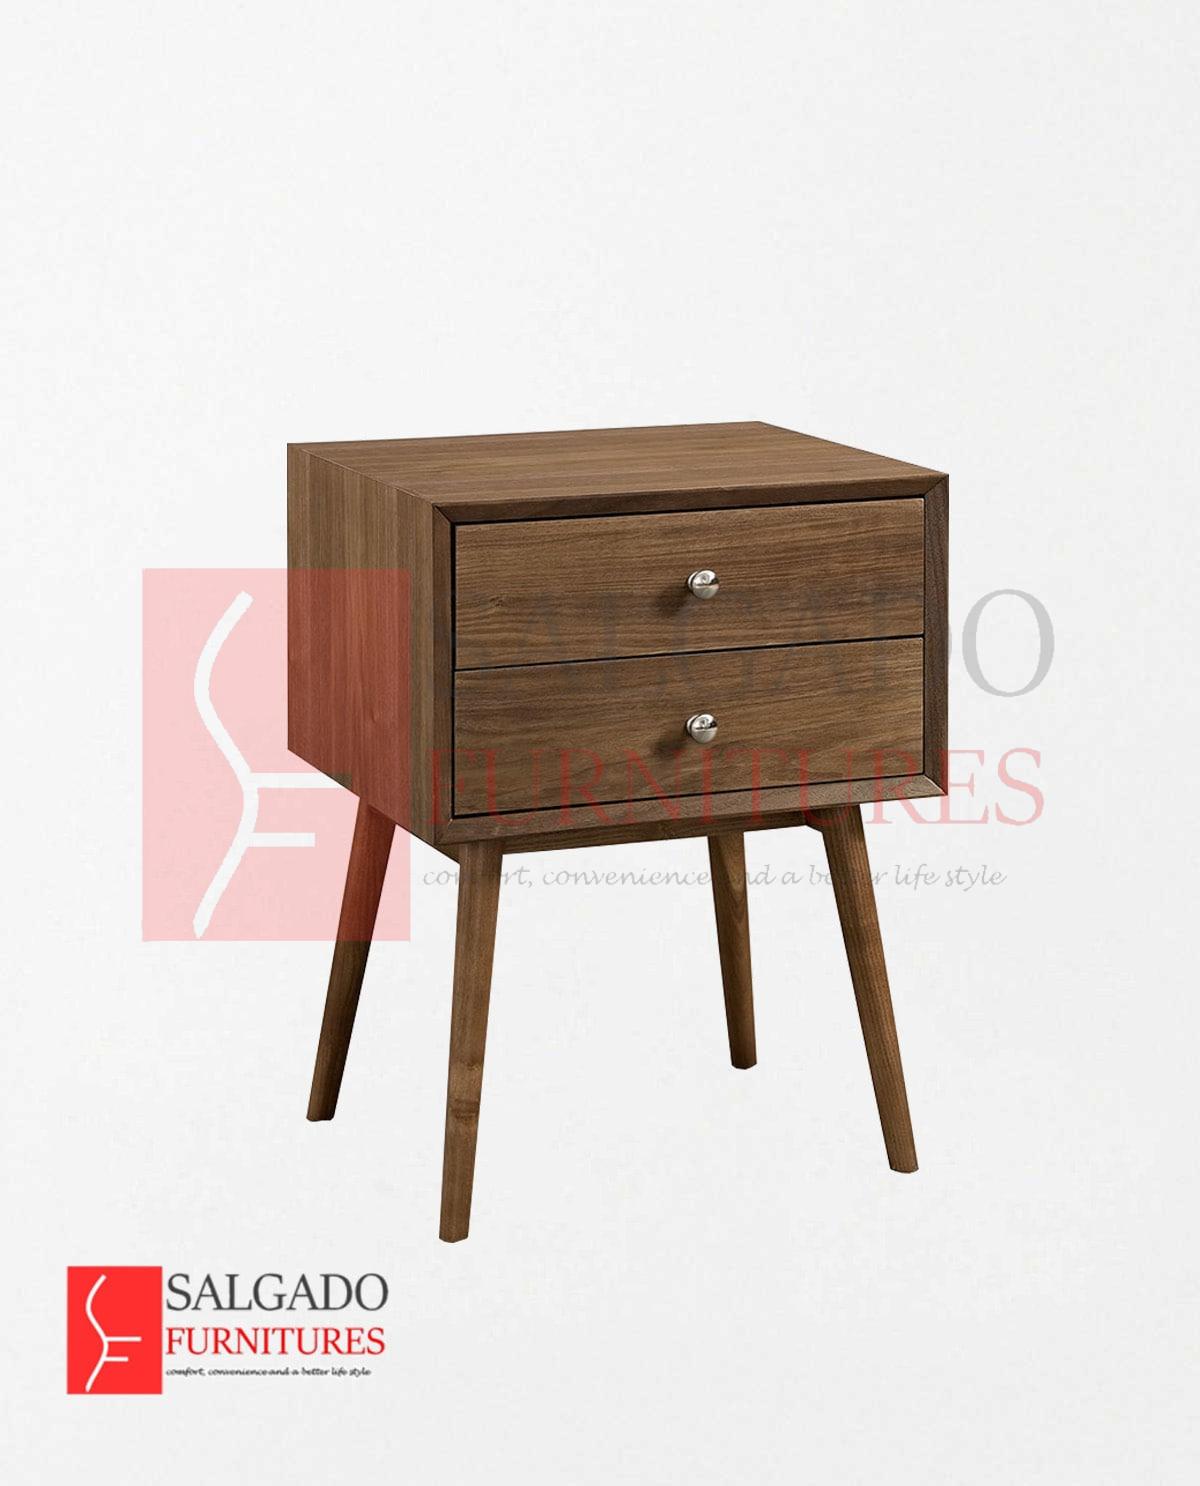 furniture-business-sri lanka